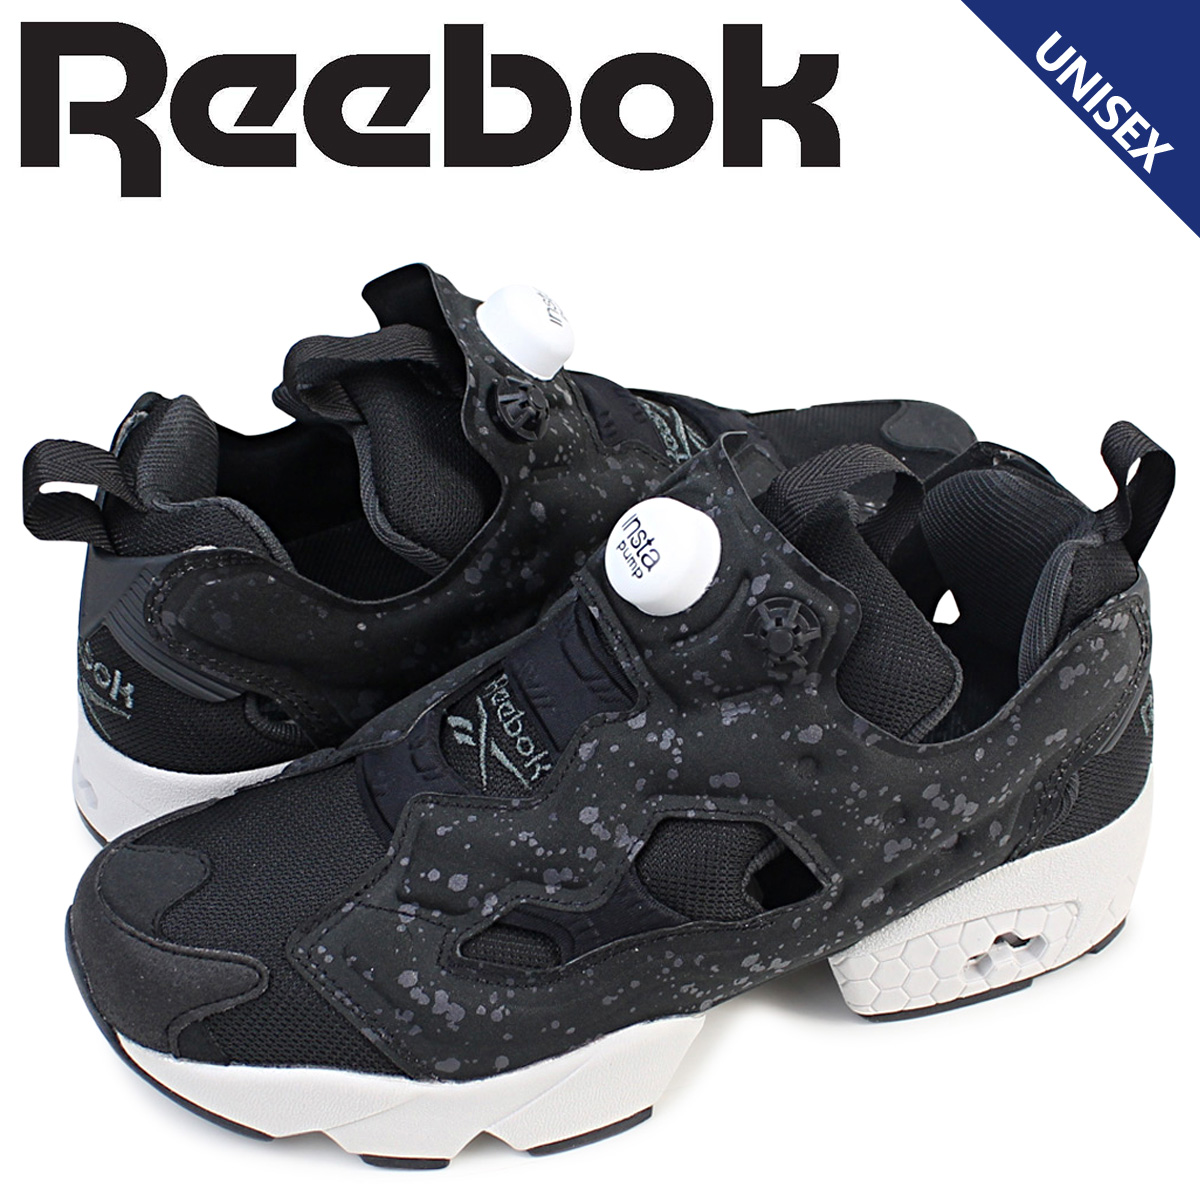 32557c123291 Reebok Reebok pump fury sneakers INSTAPUMP FURY SP AQ9803 men s women s  shoes black  8 20 new in stock